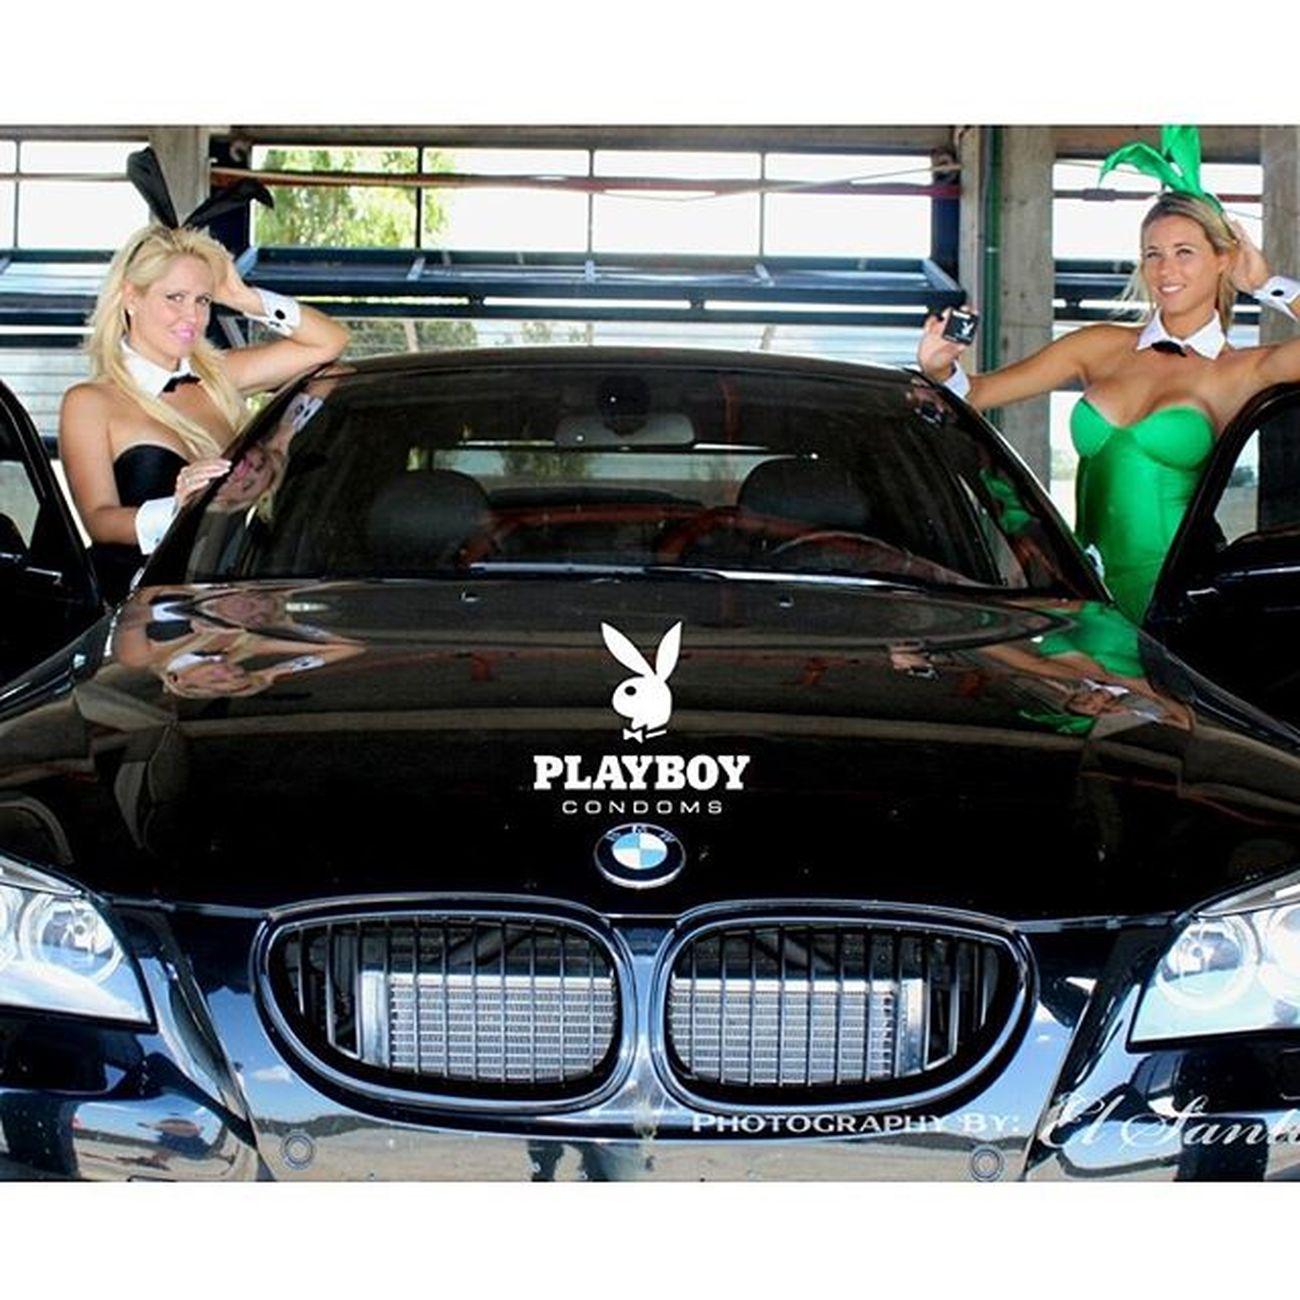 Playboycars Playboylifestyle Tracfest Mouras Speed Sportcars Ph Elsanto Playmates @andrea_anido Selvasalinas Bmw M5 Photodays Photobomb By  Playboycondoms Playboyintimates Playboyfragrances